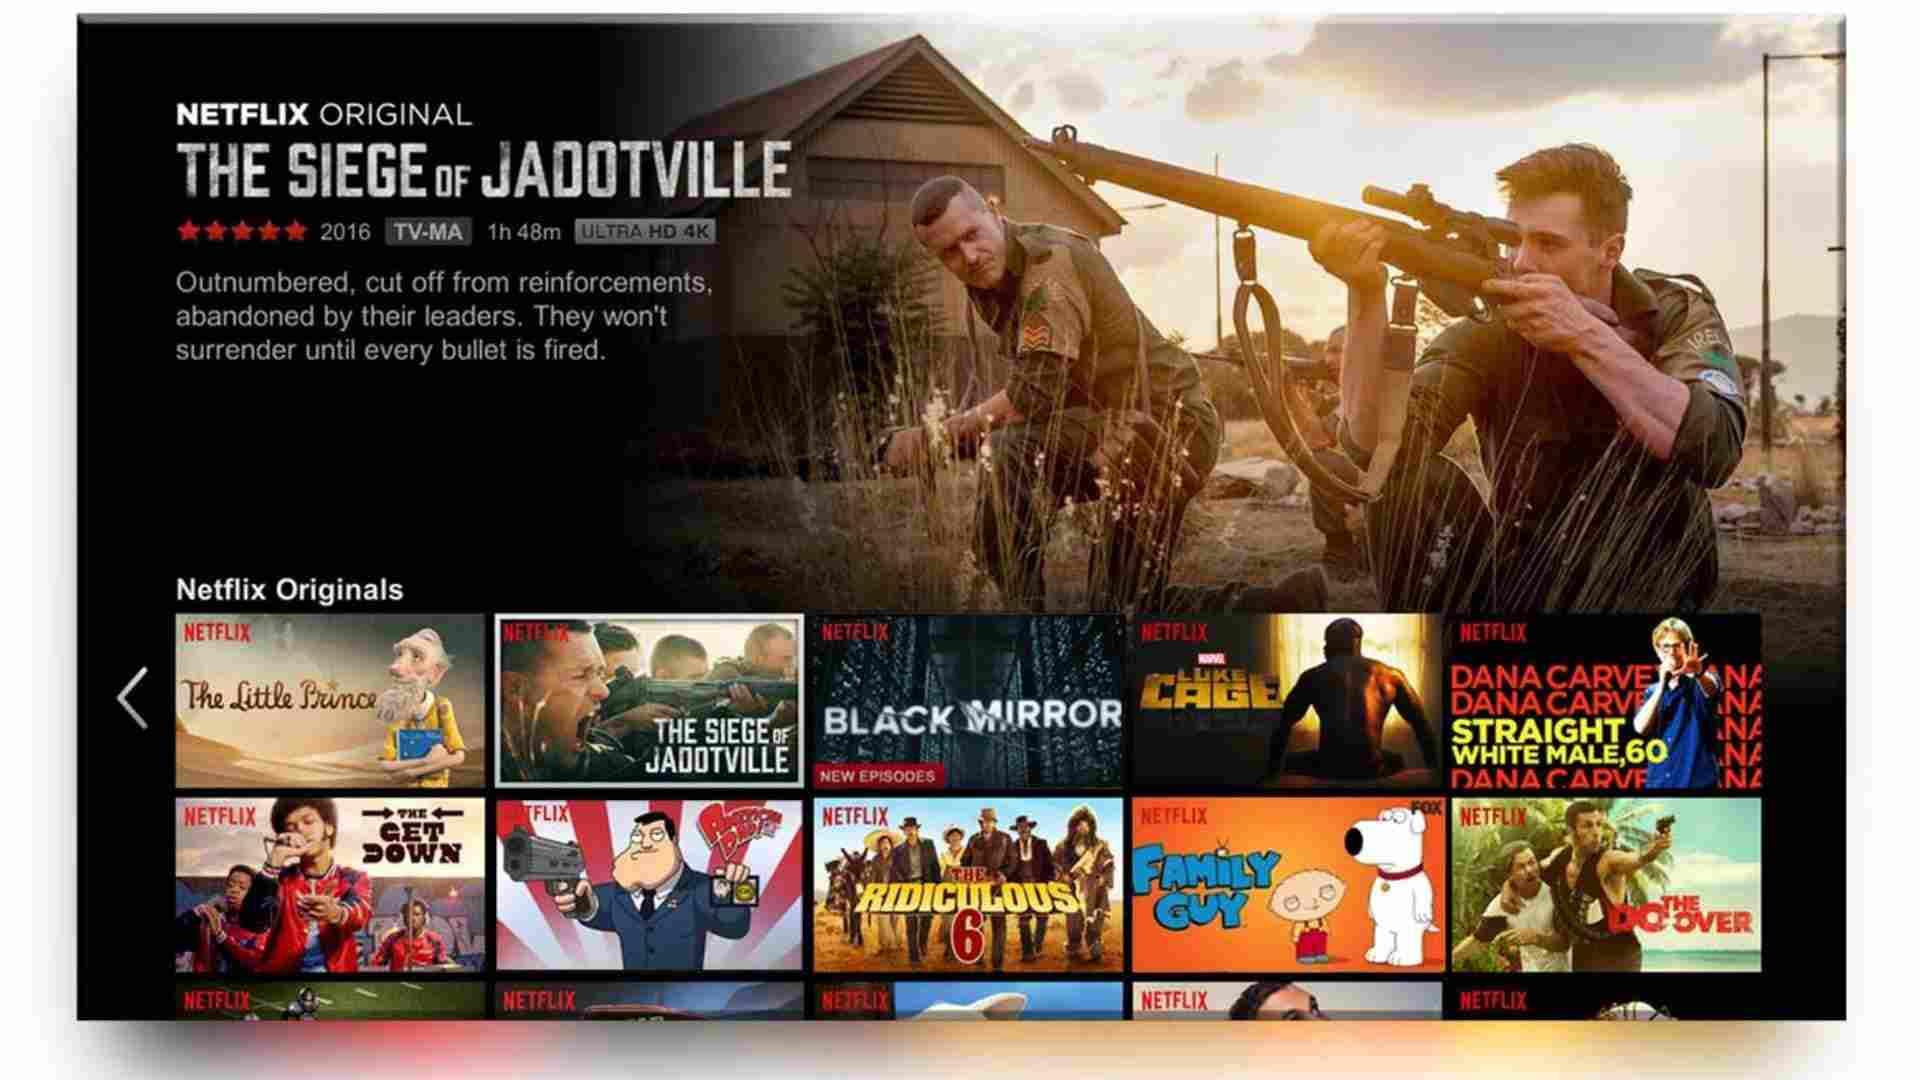 TCL Smart LED TV Netflix